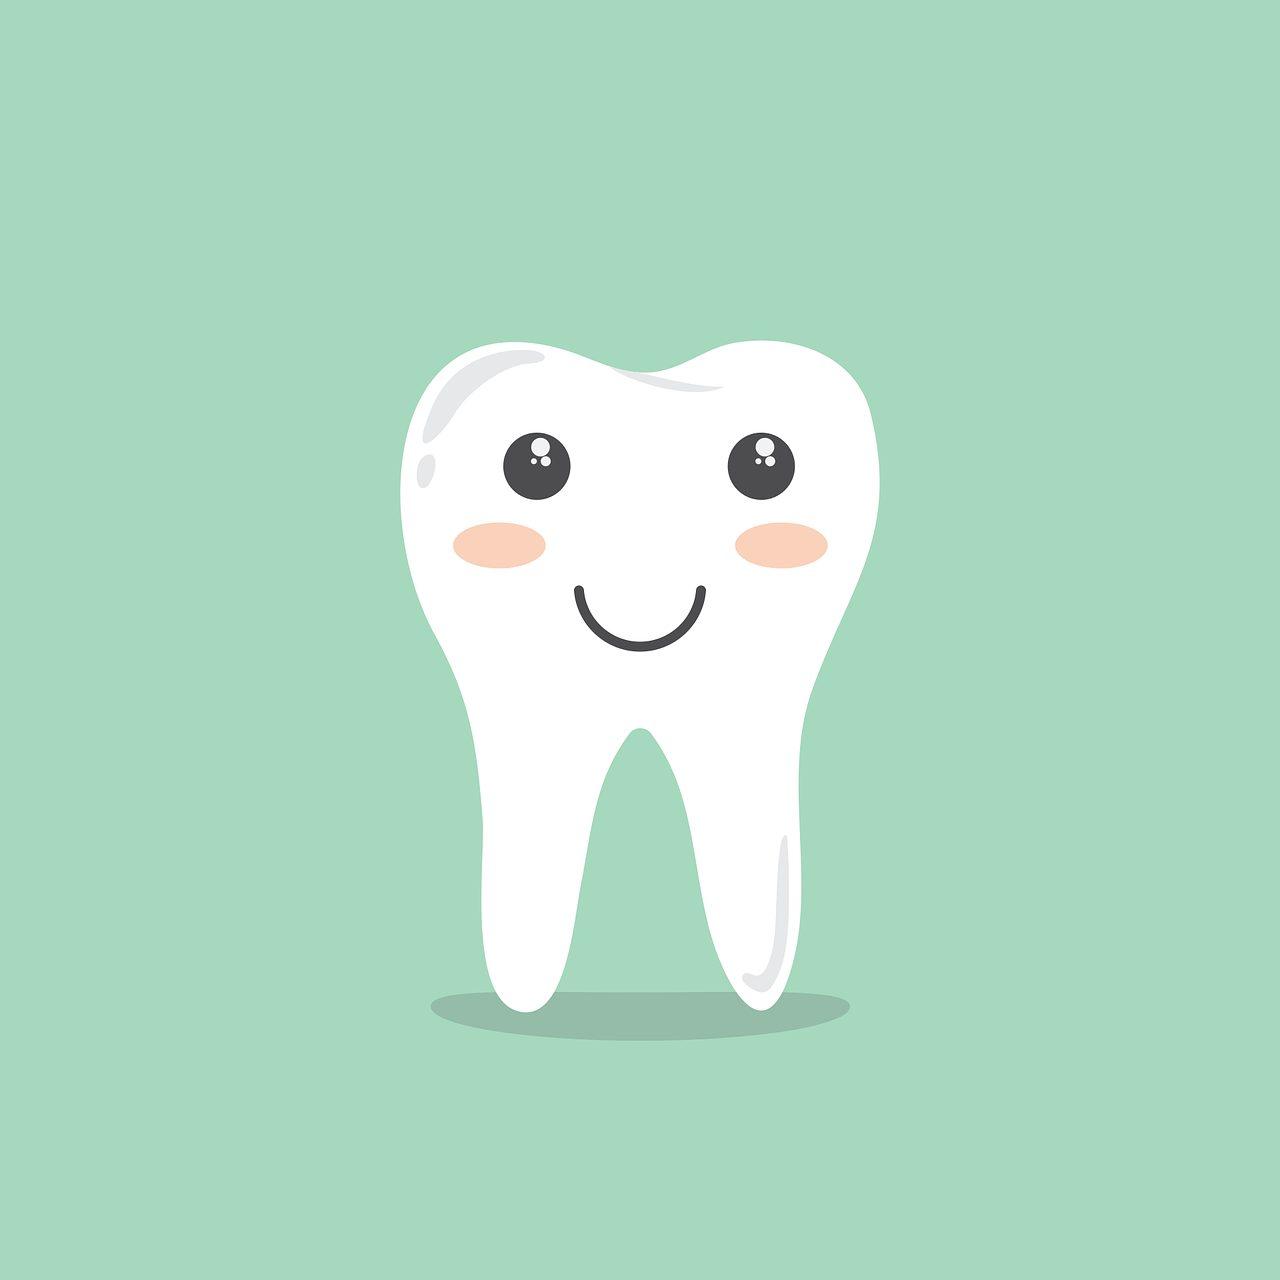 Daniel P Costas wanneer spoed tandarts